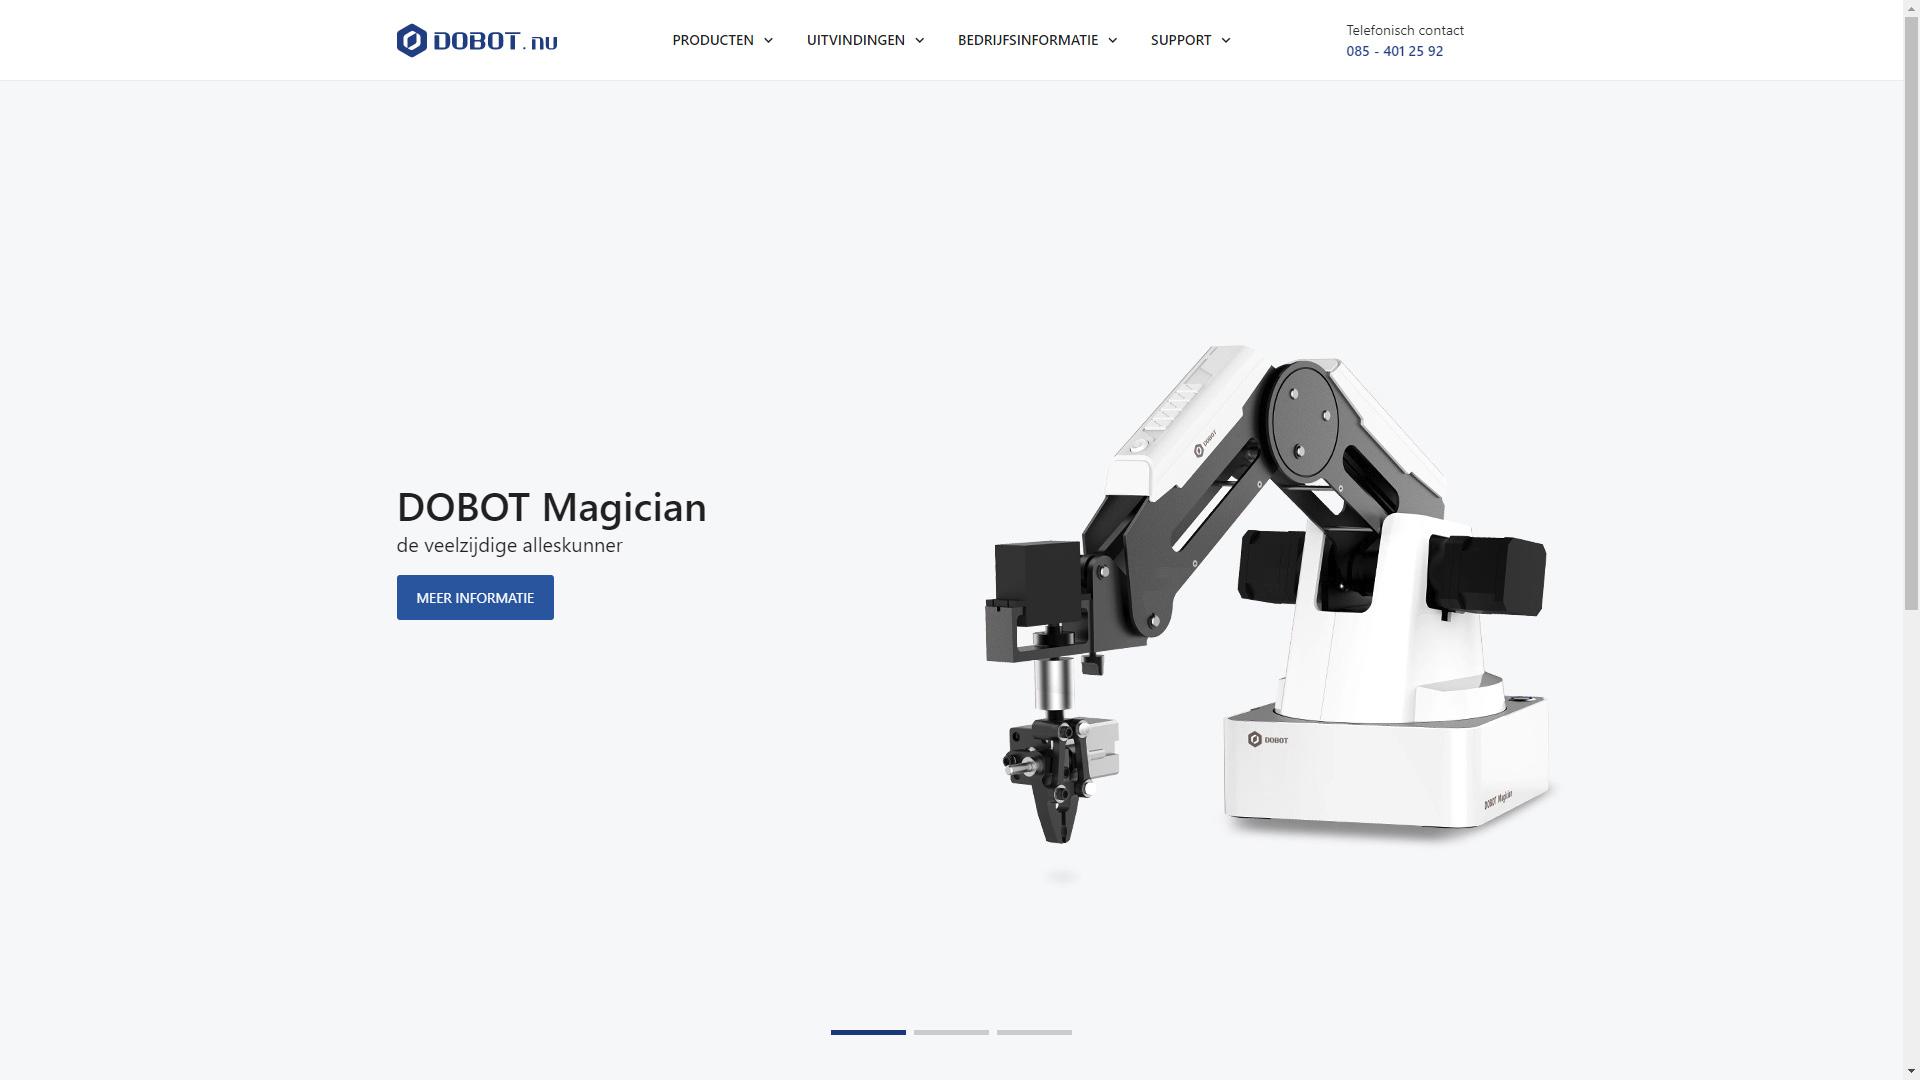 DOBOT.nu - Homepagina